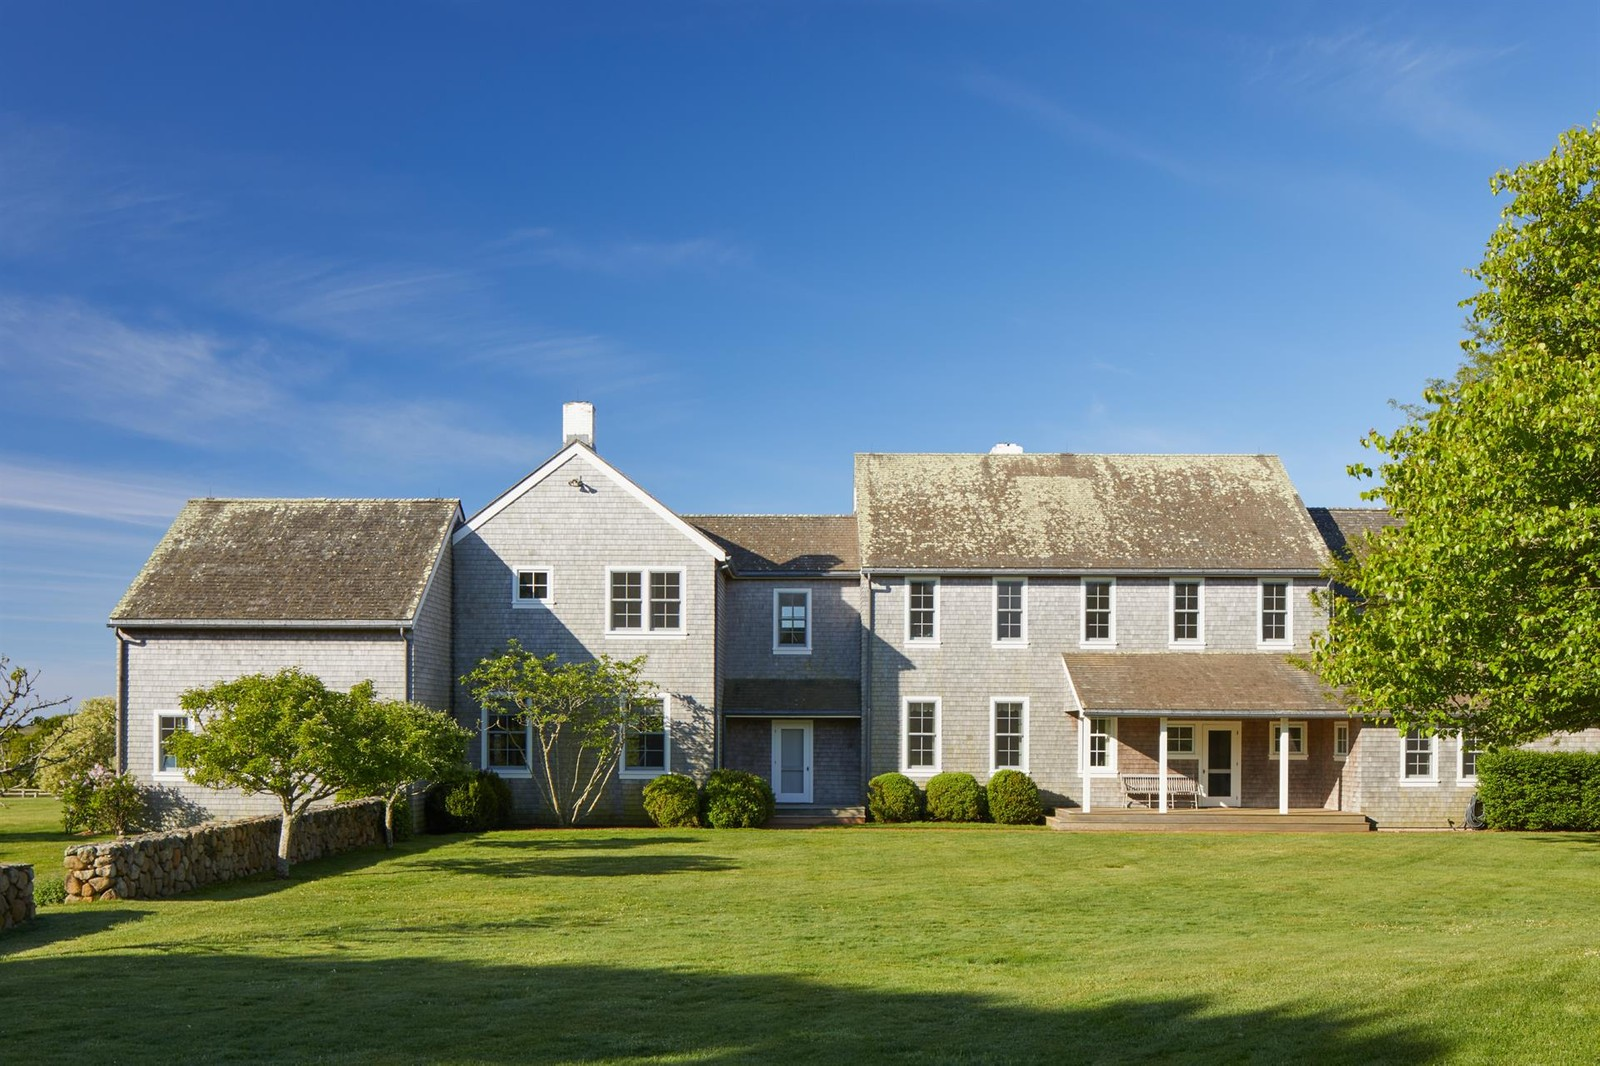 La casa è disposta su due piani / christiesrealestate.com